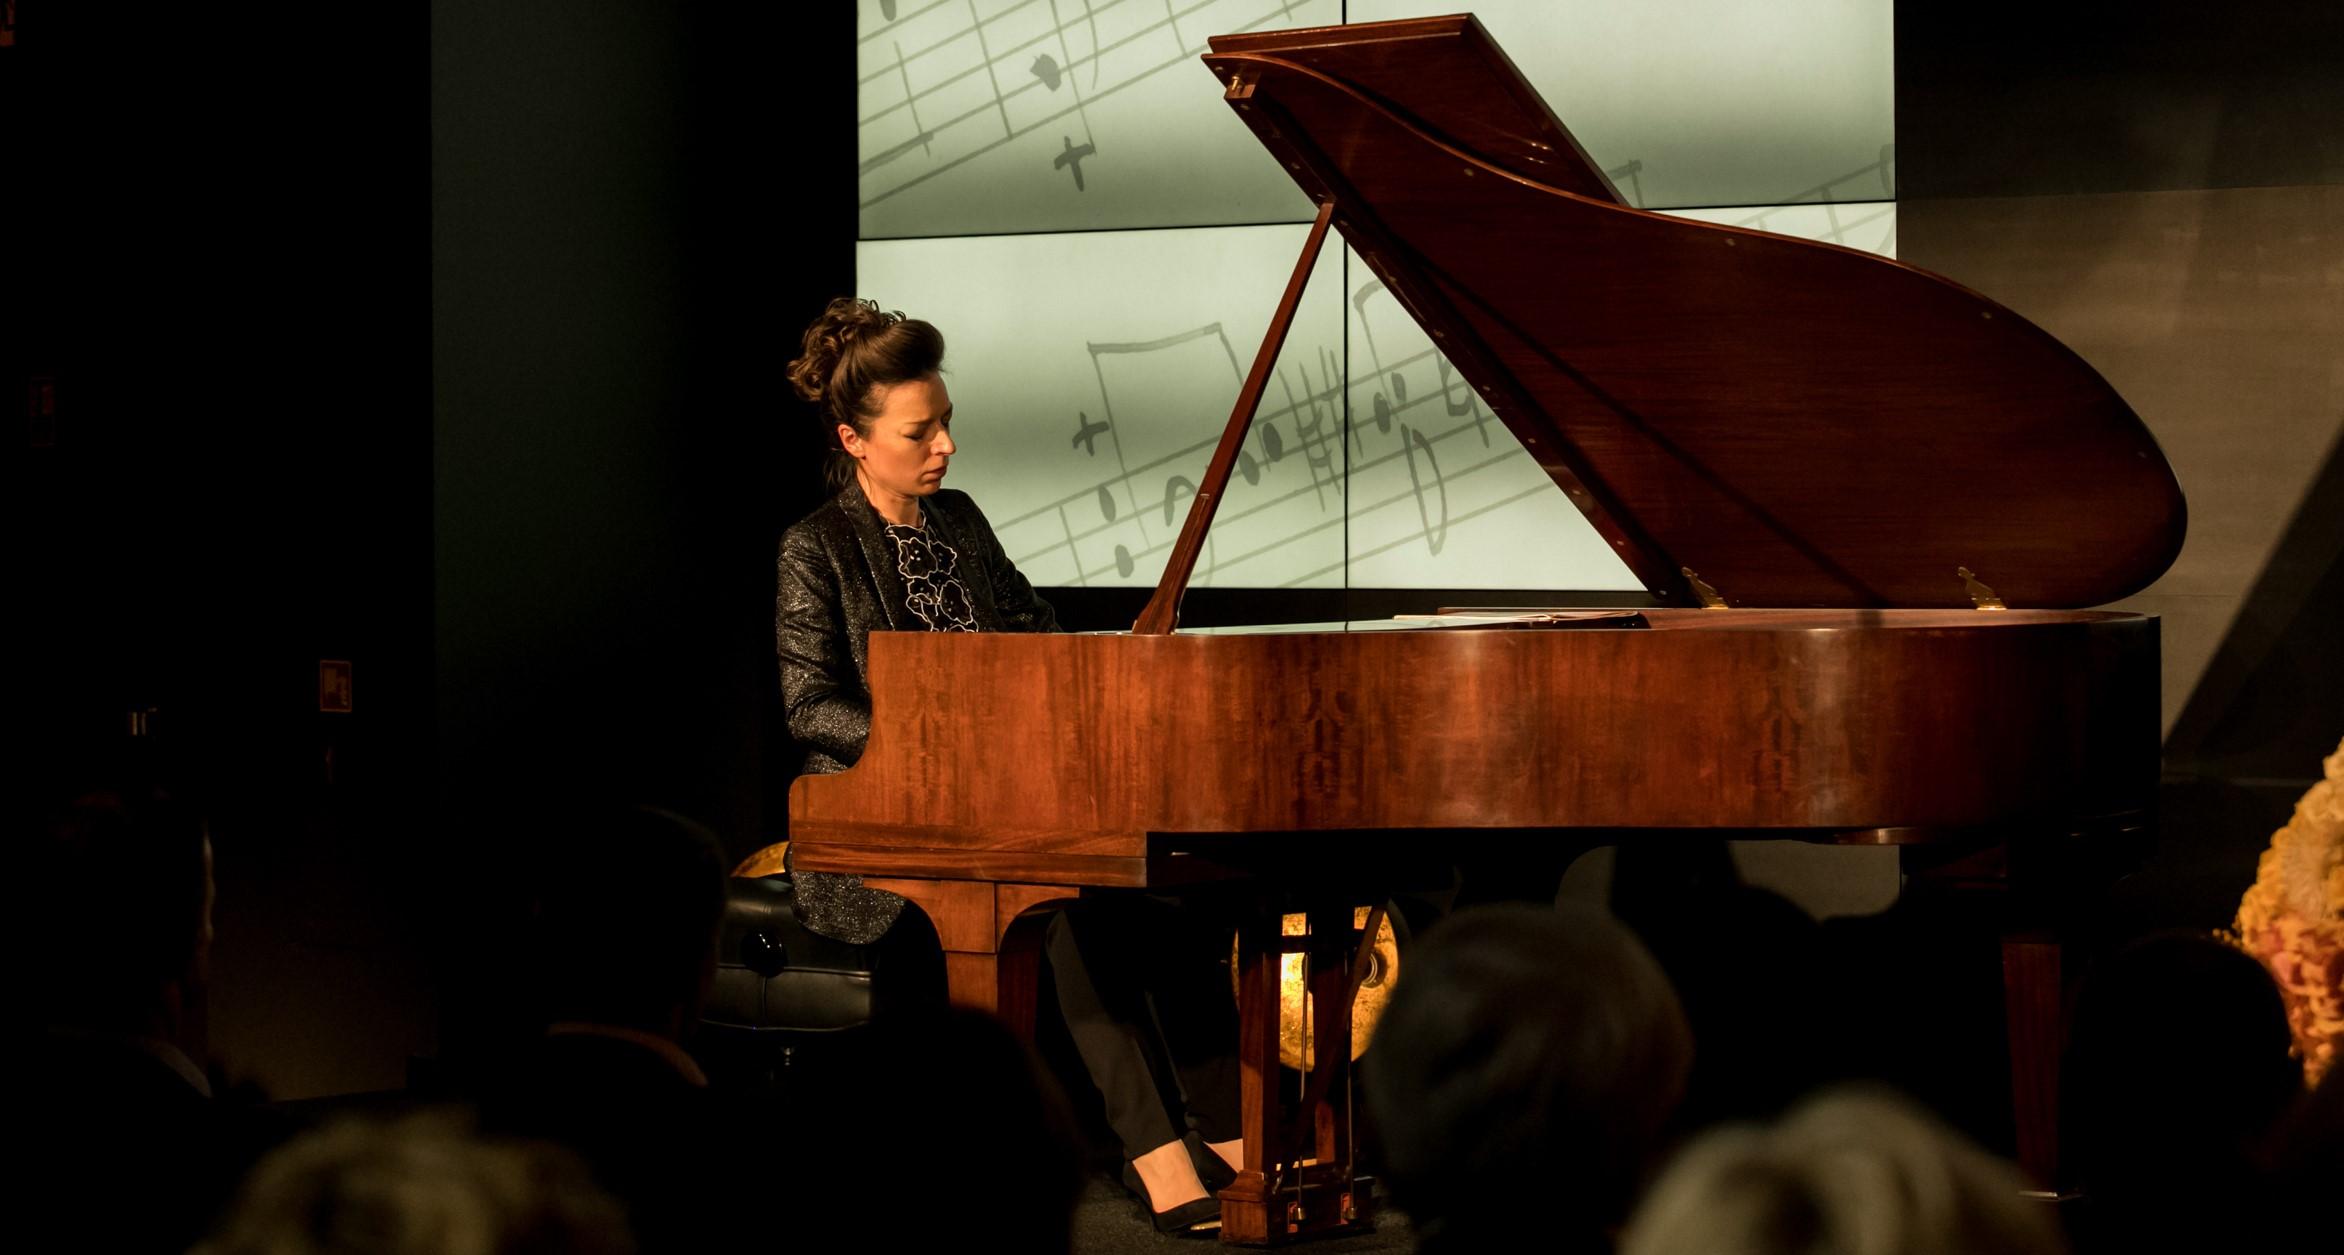 Yulianna Avdeeva, Recital of Władysław Szpilman's works at DESA Unicum